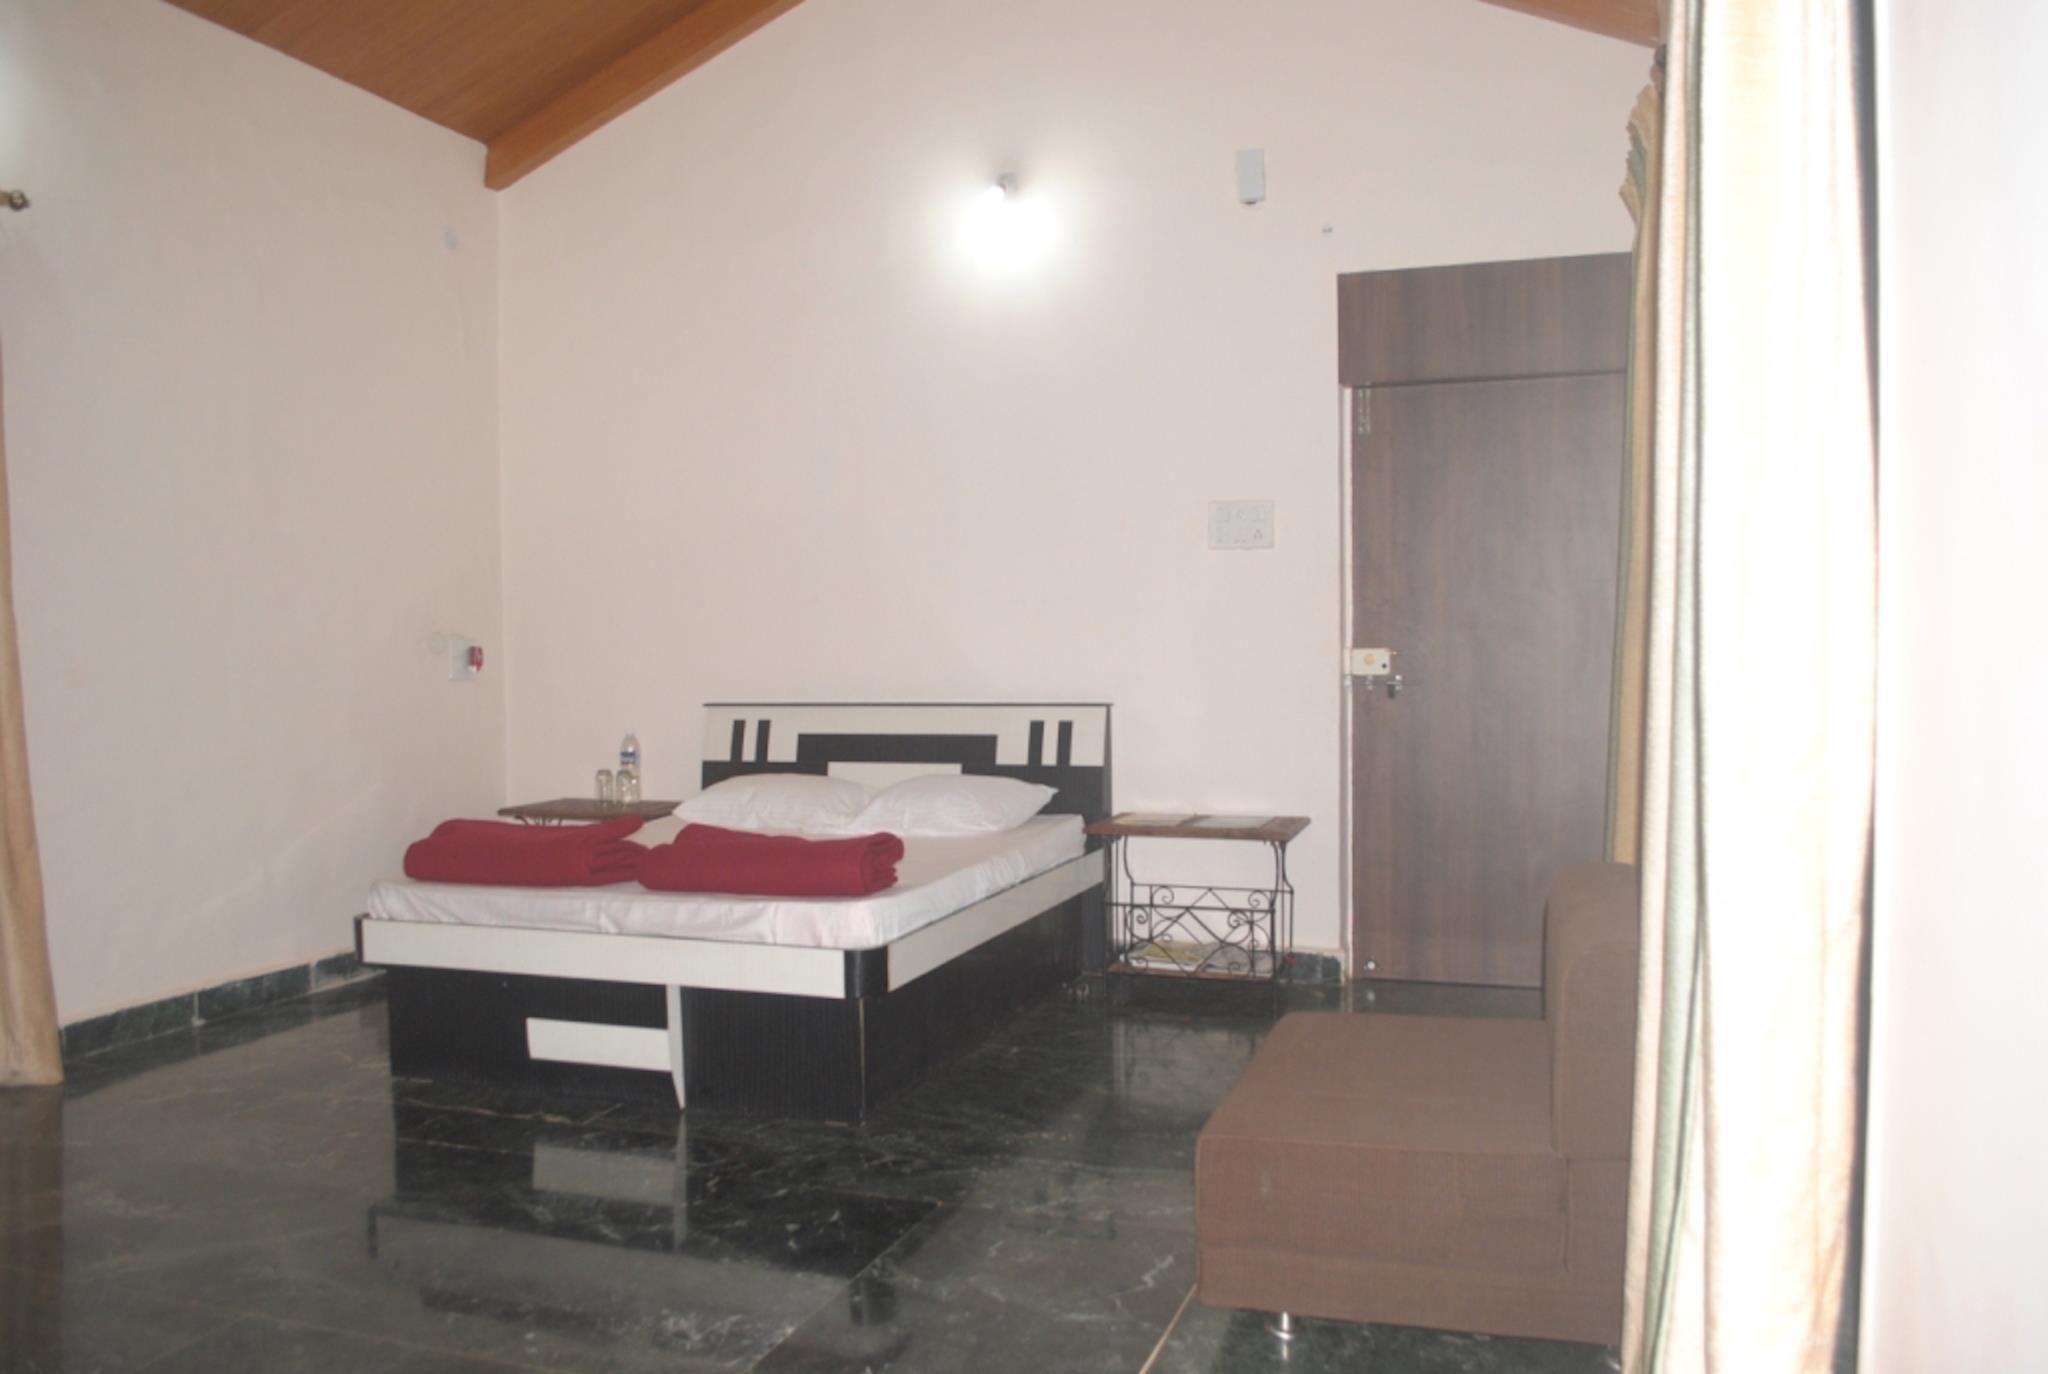 exotic home furniture. Exotic Home Stay -Panchgani Mahabaleshwar, India Furniture E